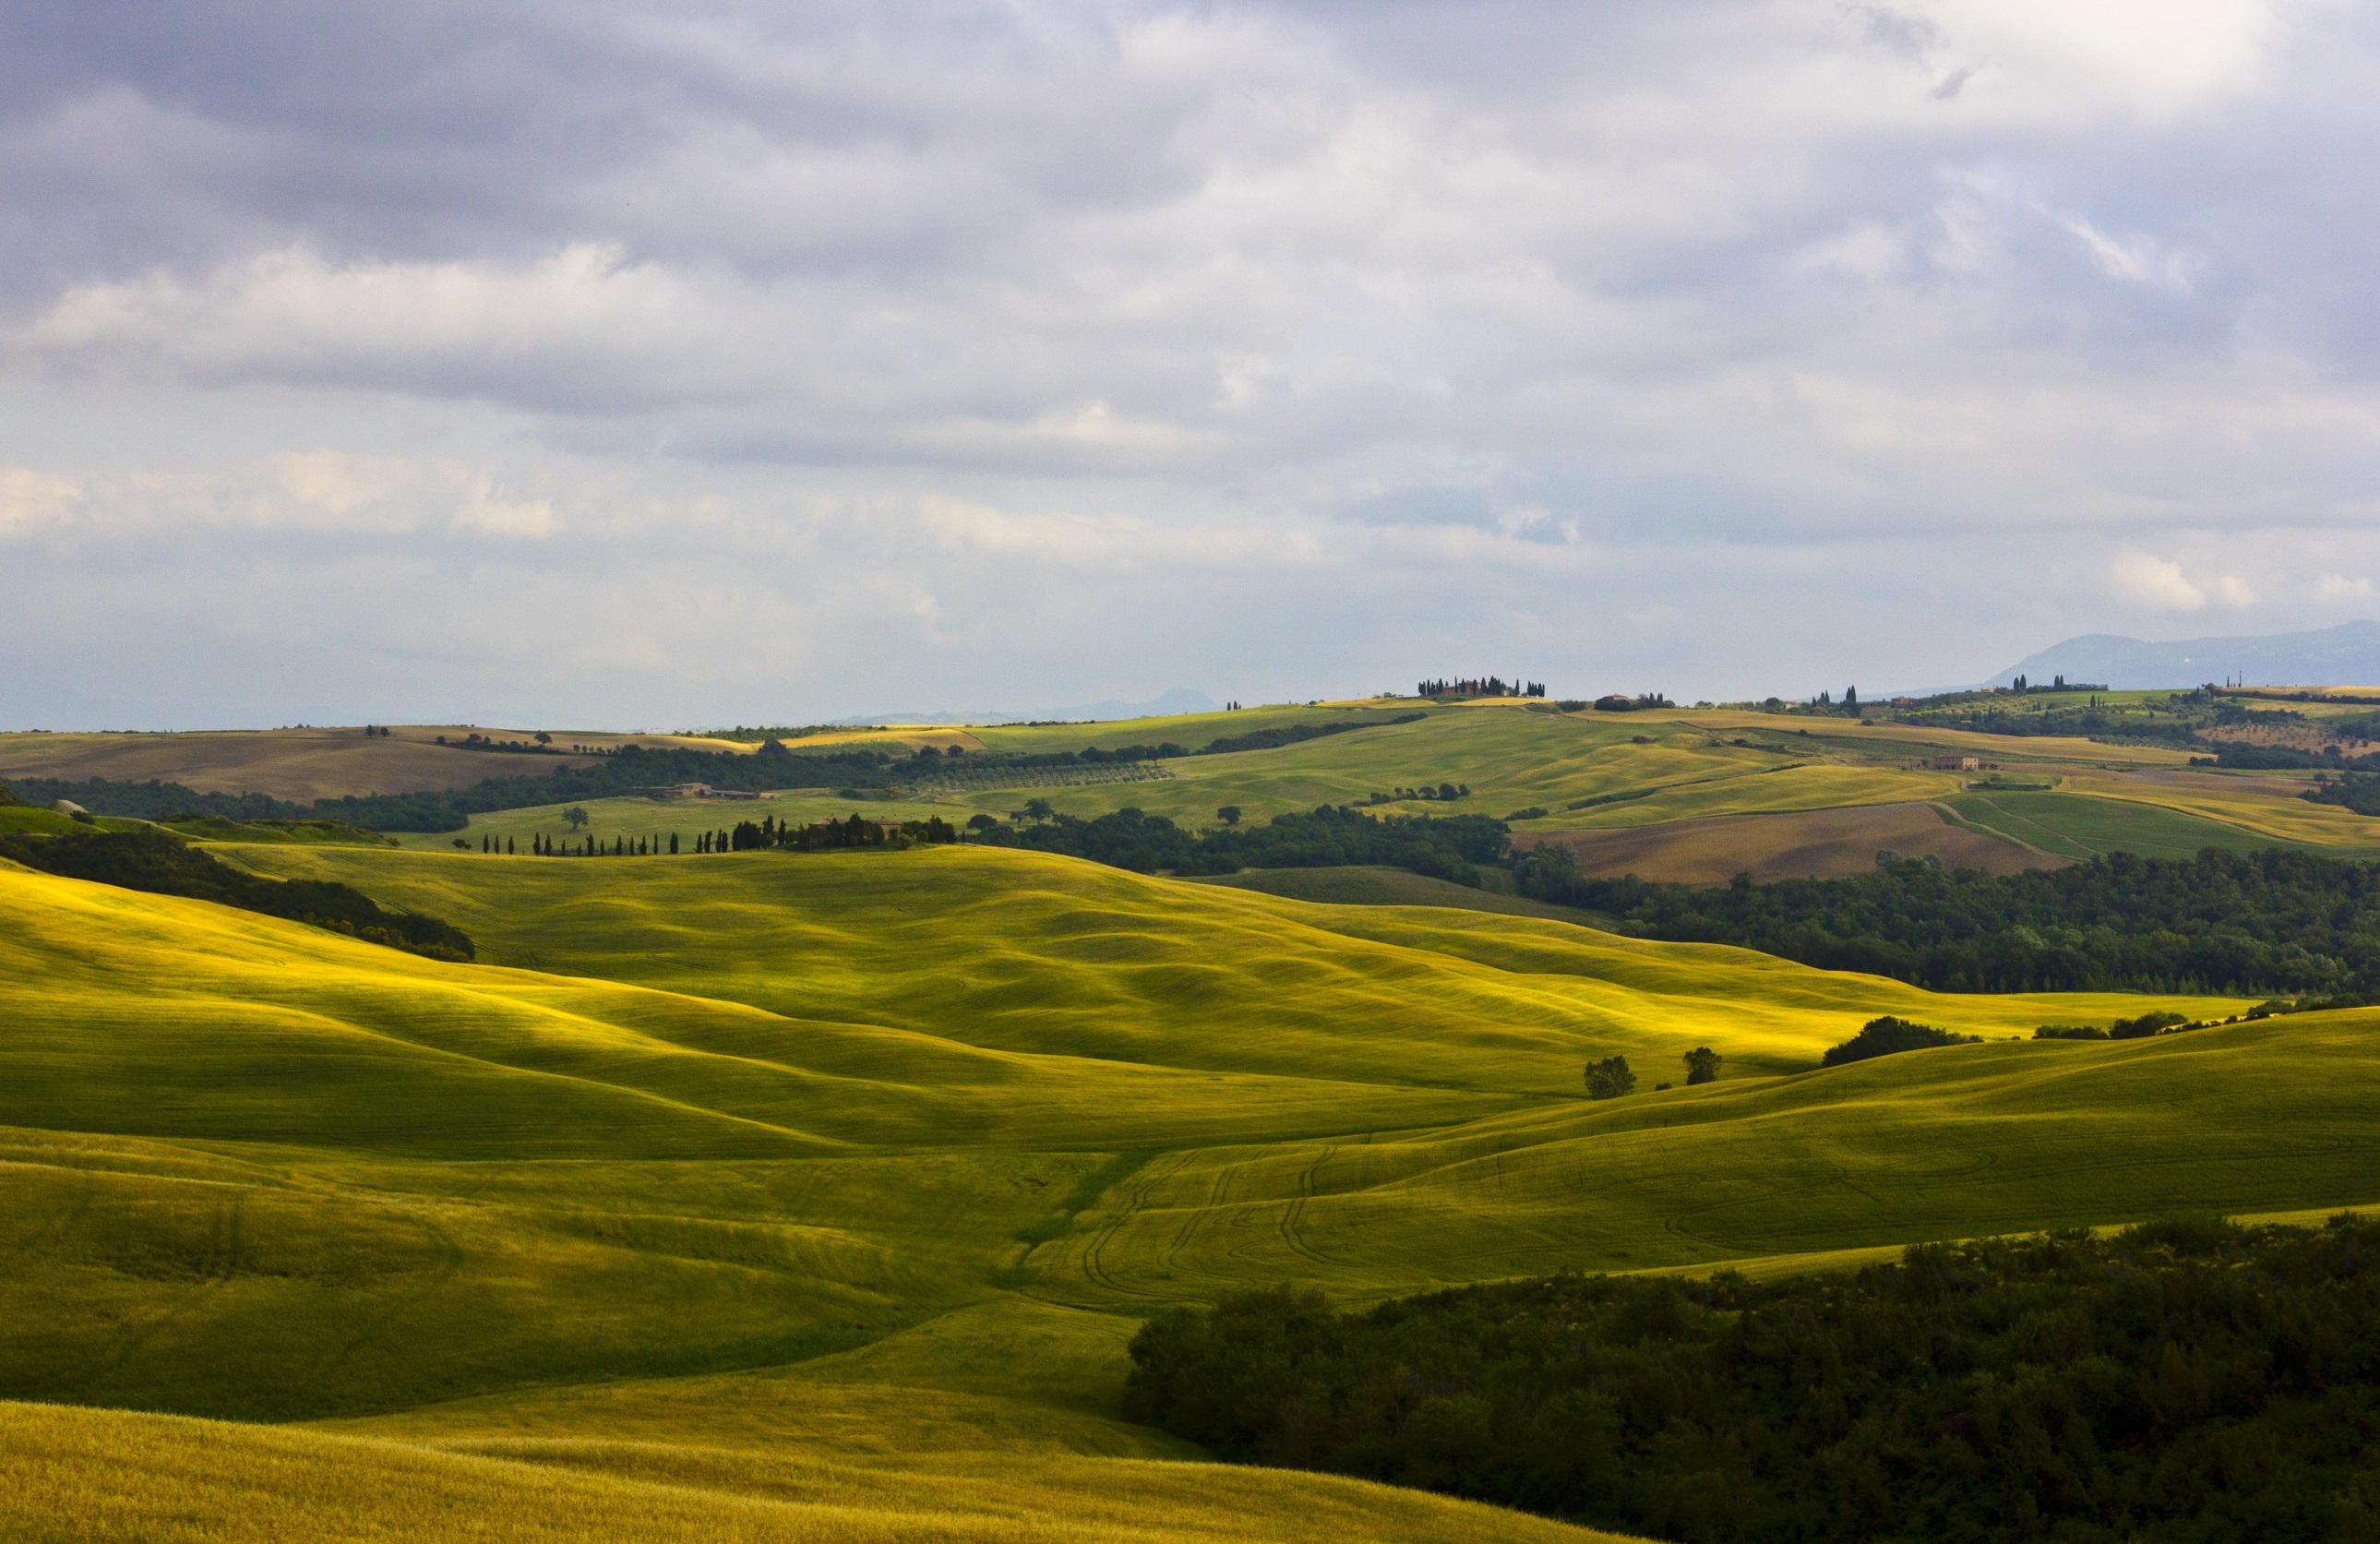 98000 Hintergrundbild herunterladen Natur, Felder, Italien, Toskana, Montalcino - Bildschirmschoner und Bilder kostenlos